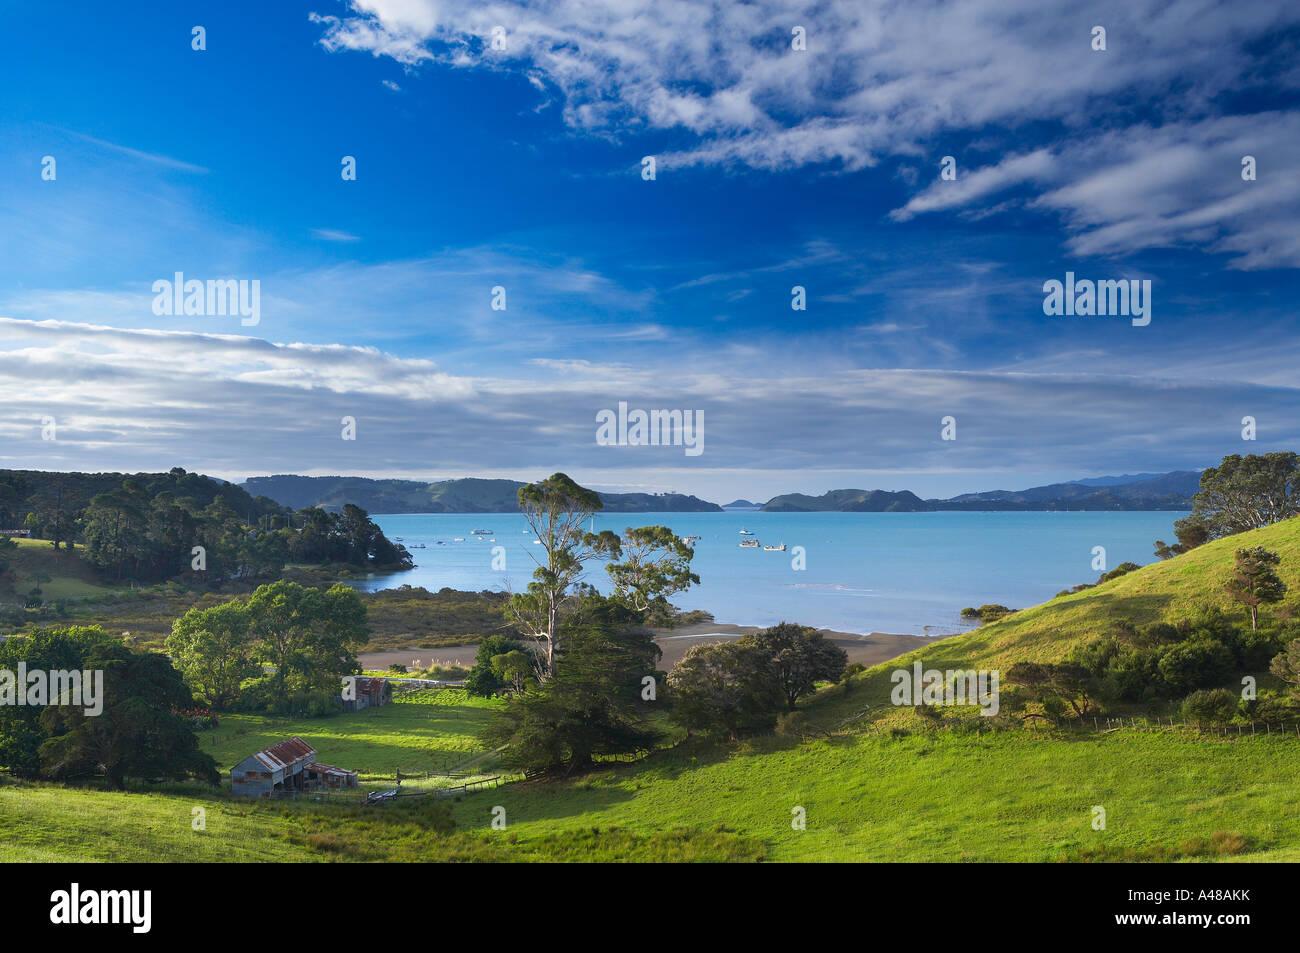 Te Kouma overlooking Coromandel Harbour Coromandel Peninsula North Island New Zealand NR - Stock Image